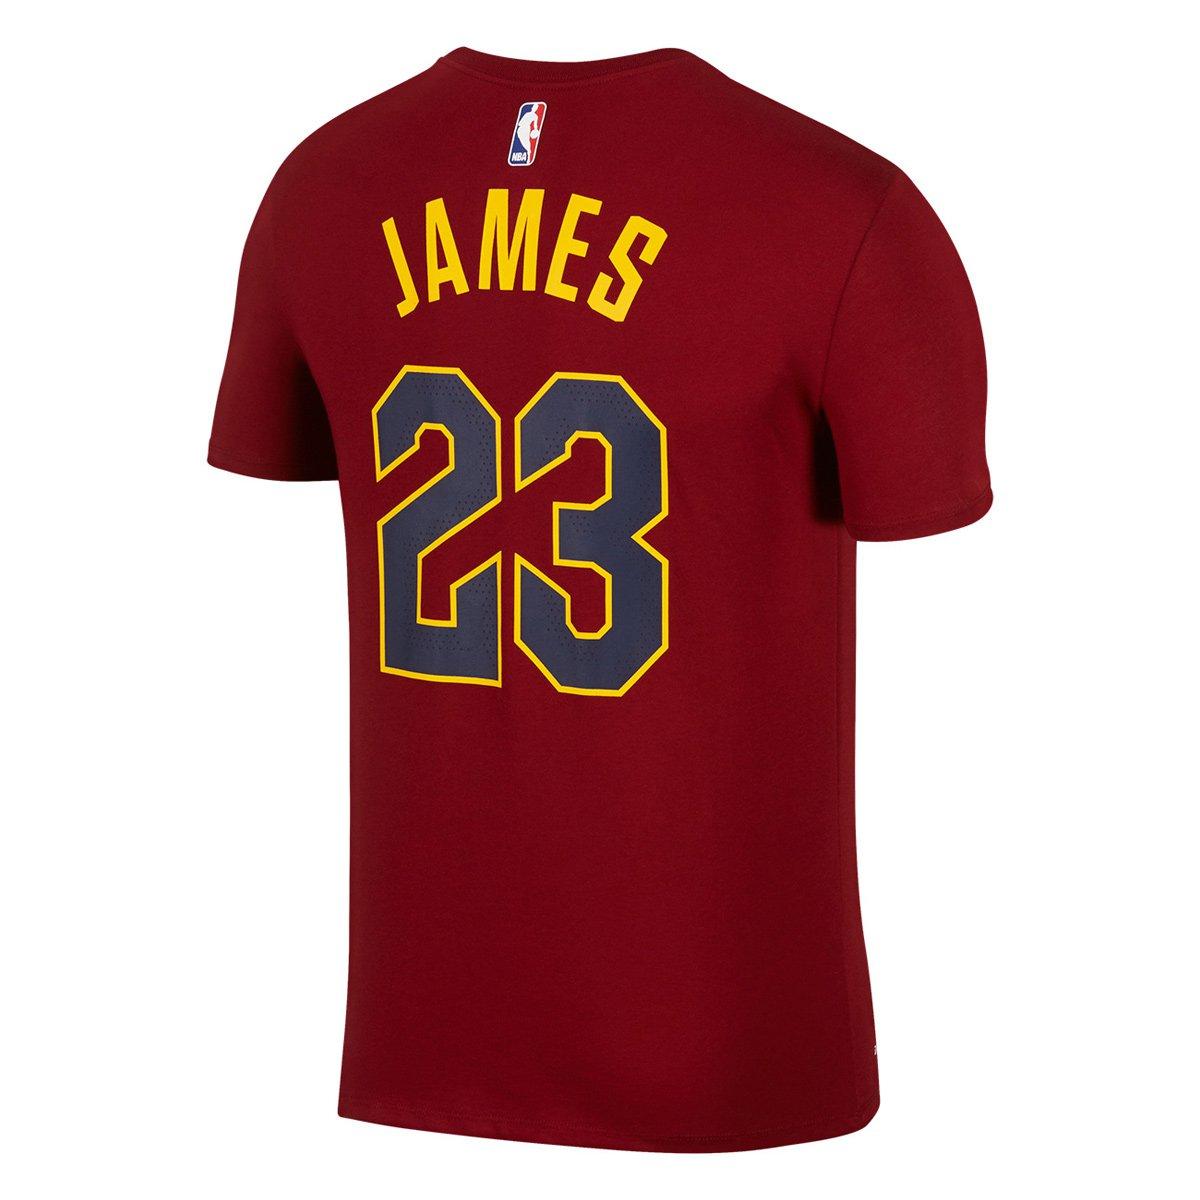 727bf78ed Camiseta NBA Lebron James Cleveland Cavaliers Nike N N - Compre Agora